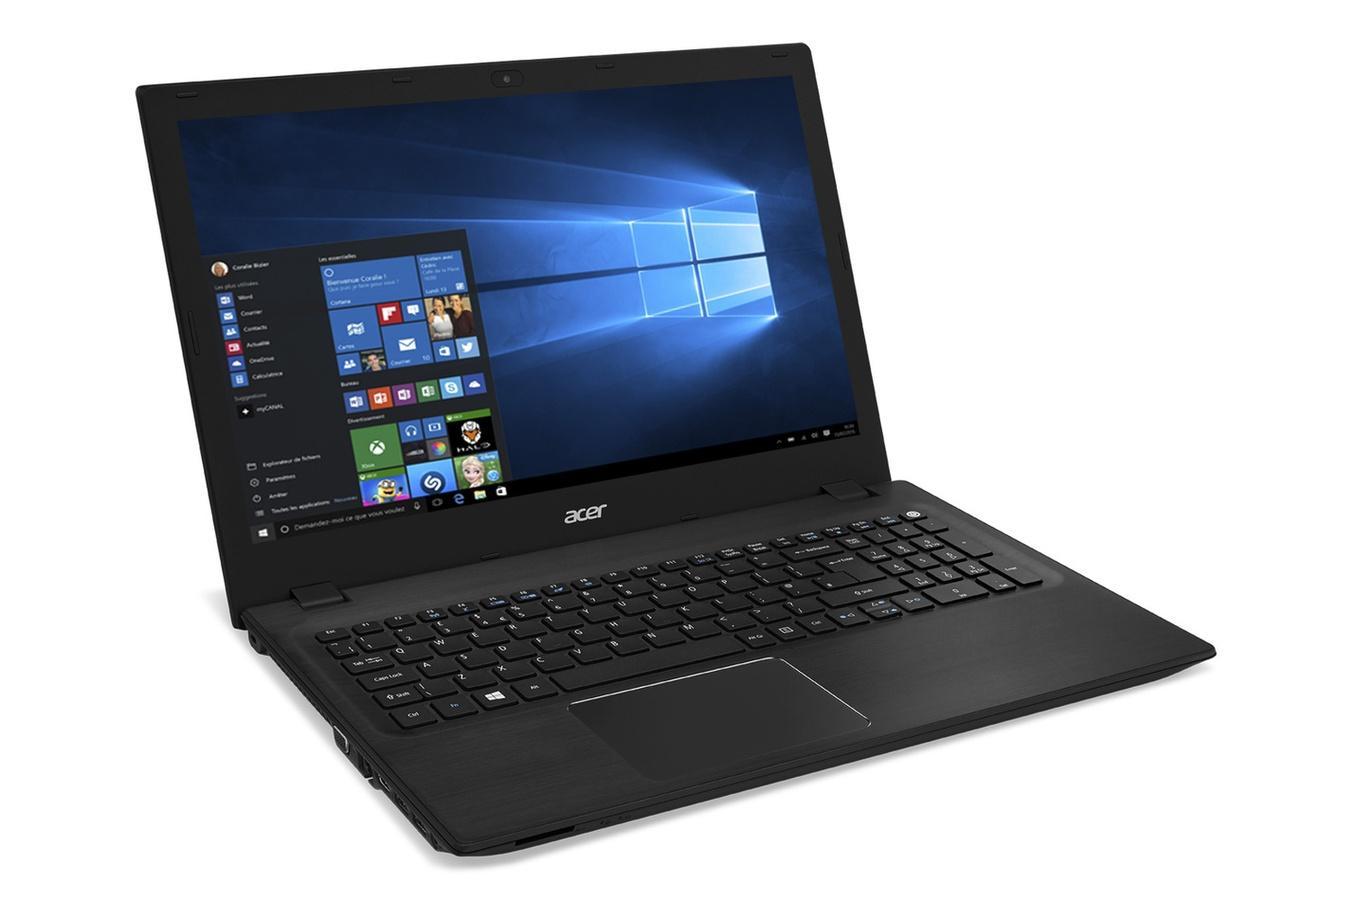 "PC portable 15.6"" full HD Acer F5-572G-784R (i7-6500U, 940M, 16 Go de Ram, 2 To)"